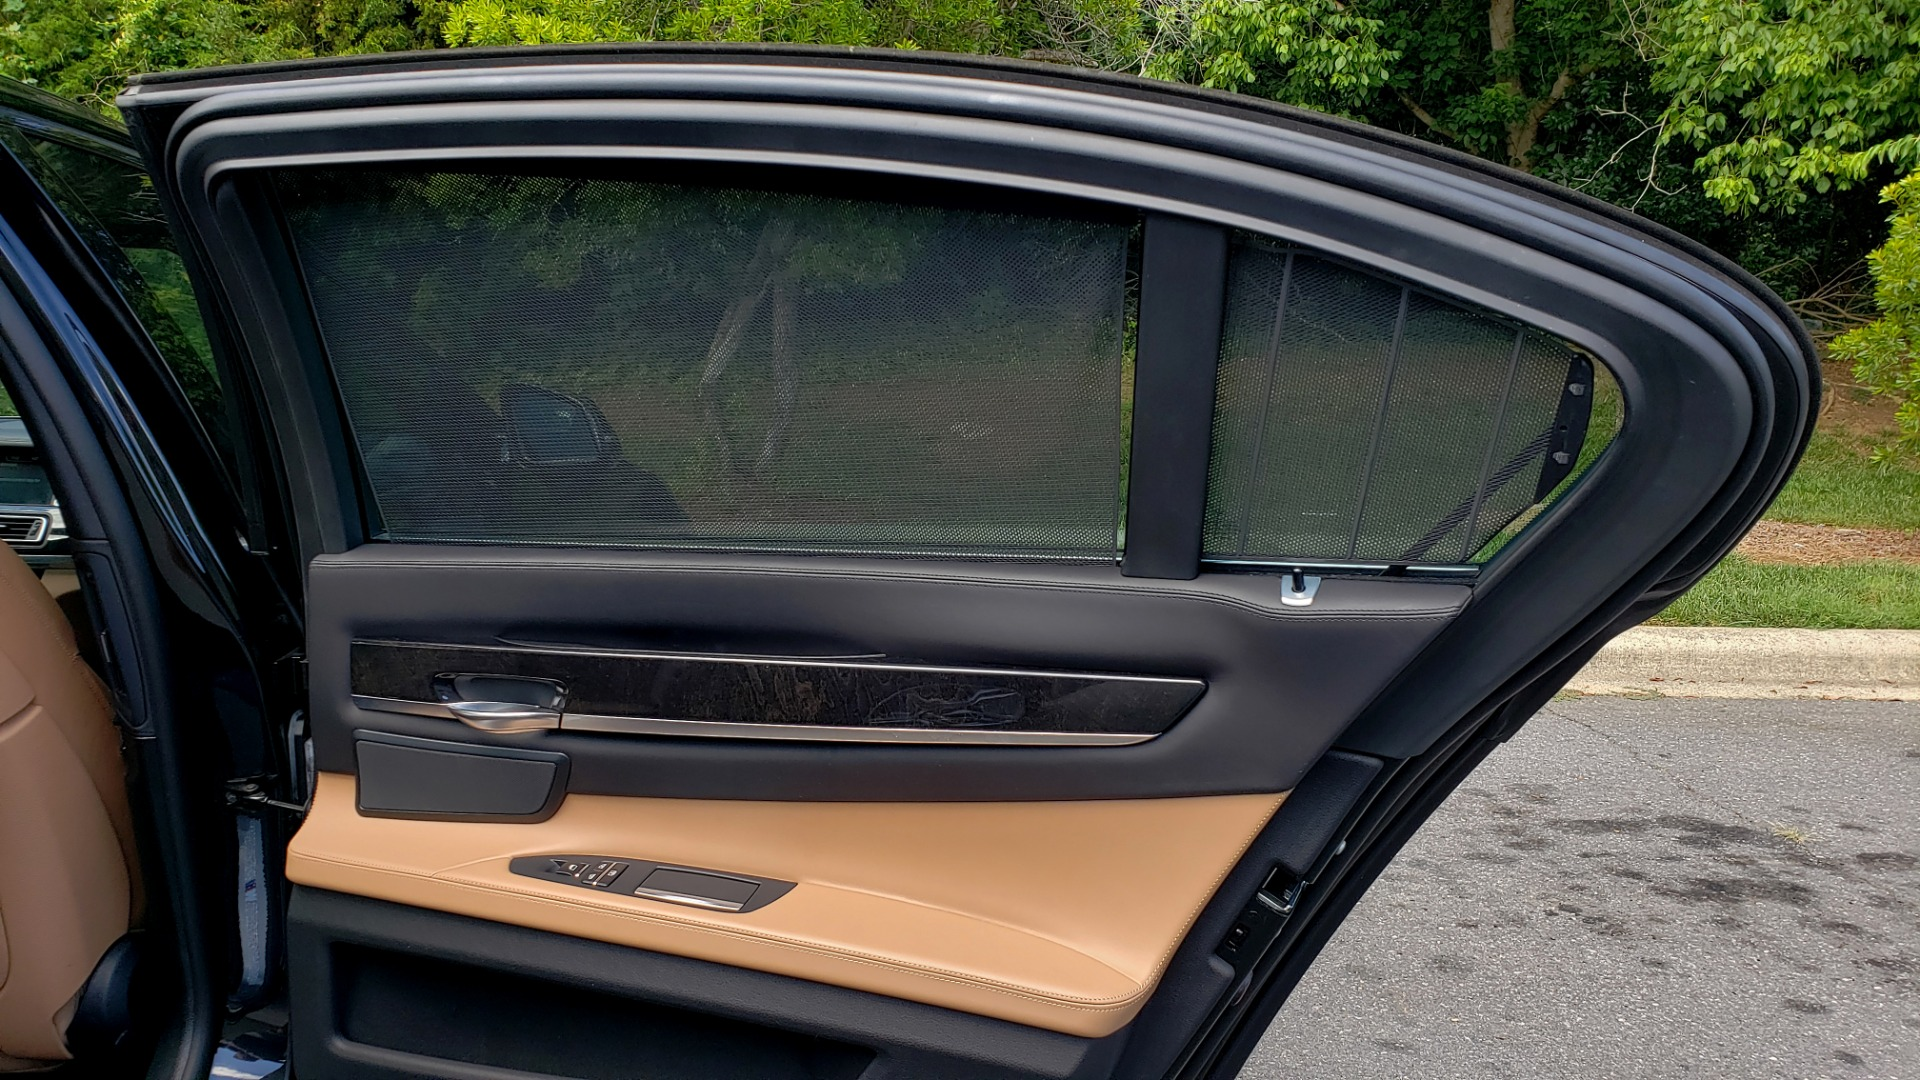 Used 2014 BMW 7 SERIES 750LI M-SPORT / EXEC PKG / DRVR ASST / LIGHTING / NAV / SUNROOF for sale Sold at Formula Imports in Charlotte NC 28227 69